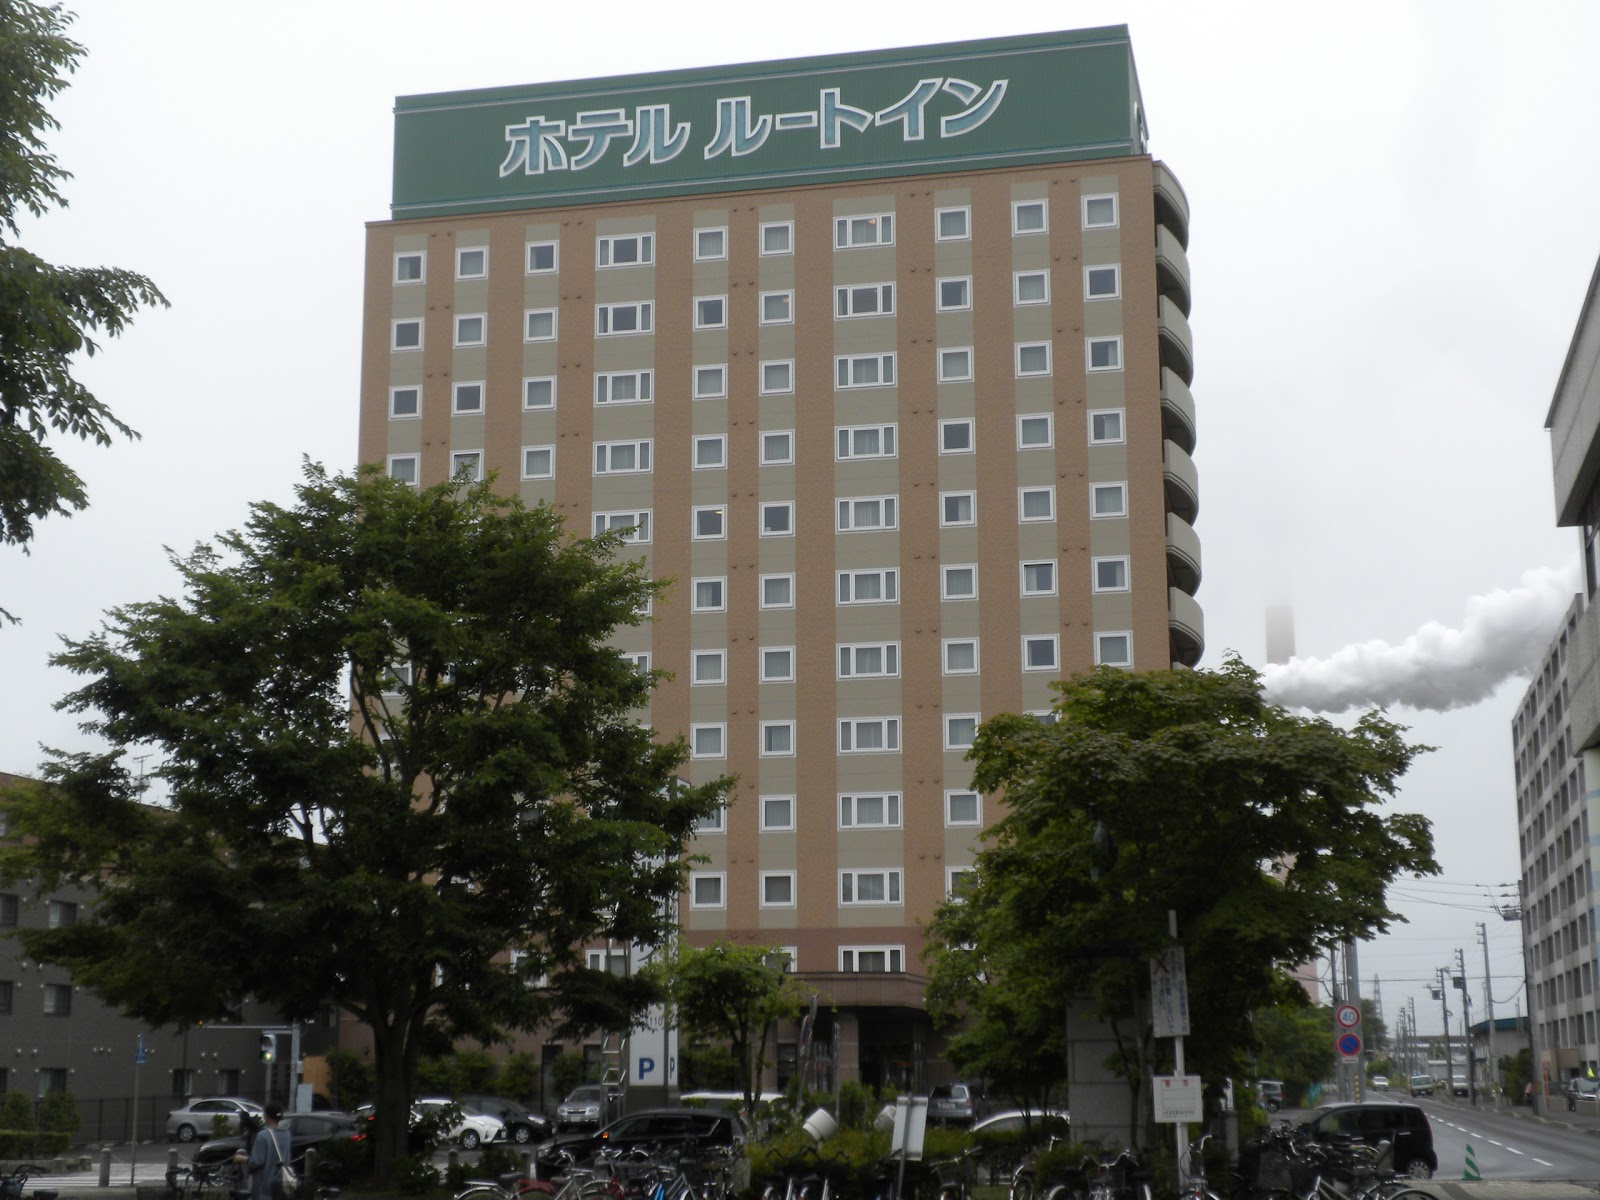 Hotel Route Inn Tomakomai Ekimae Relaxation Of Hot Water Tomakomai Hotel Sugita Around Guides